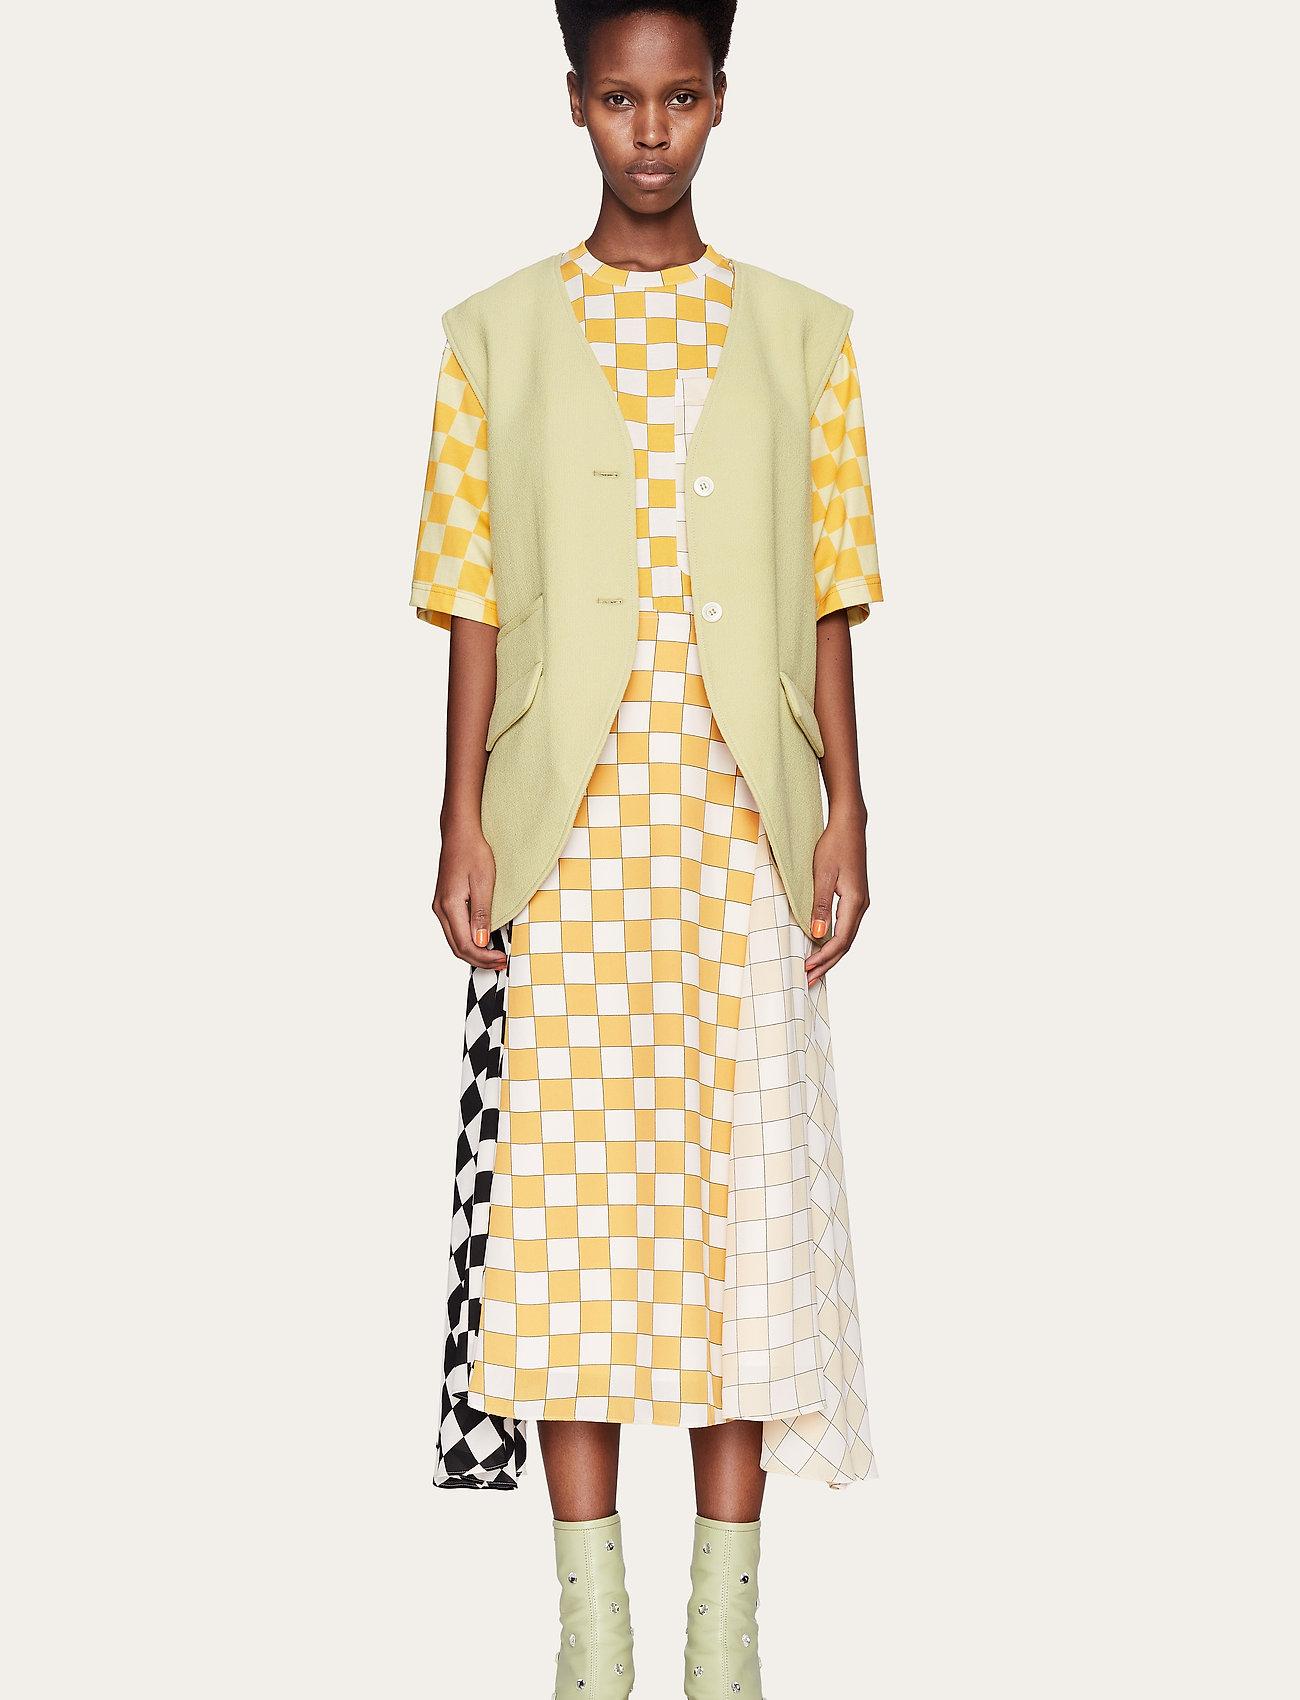 STINE GOYA - Hilma, 1114 Pistachio Tailoring - puffer vests - pistachio - 0